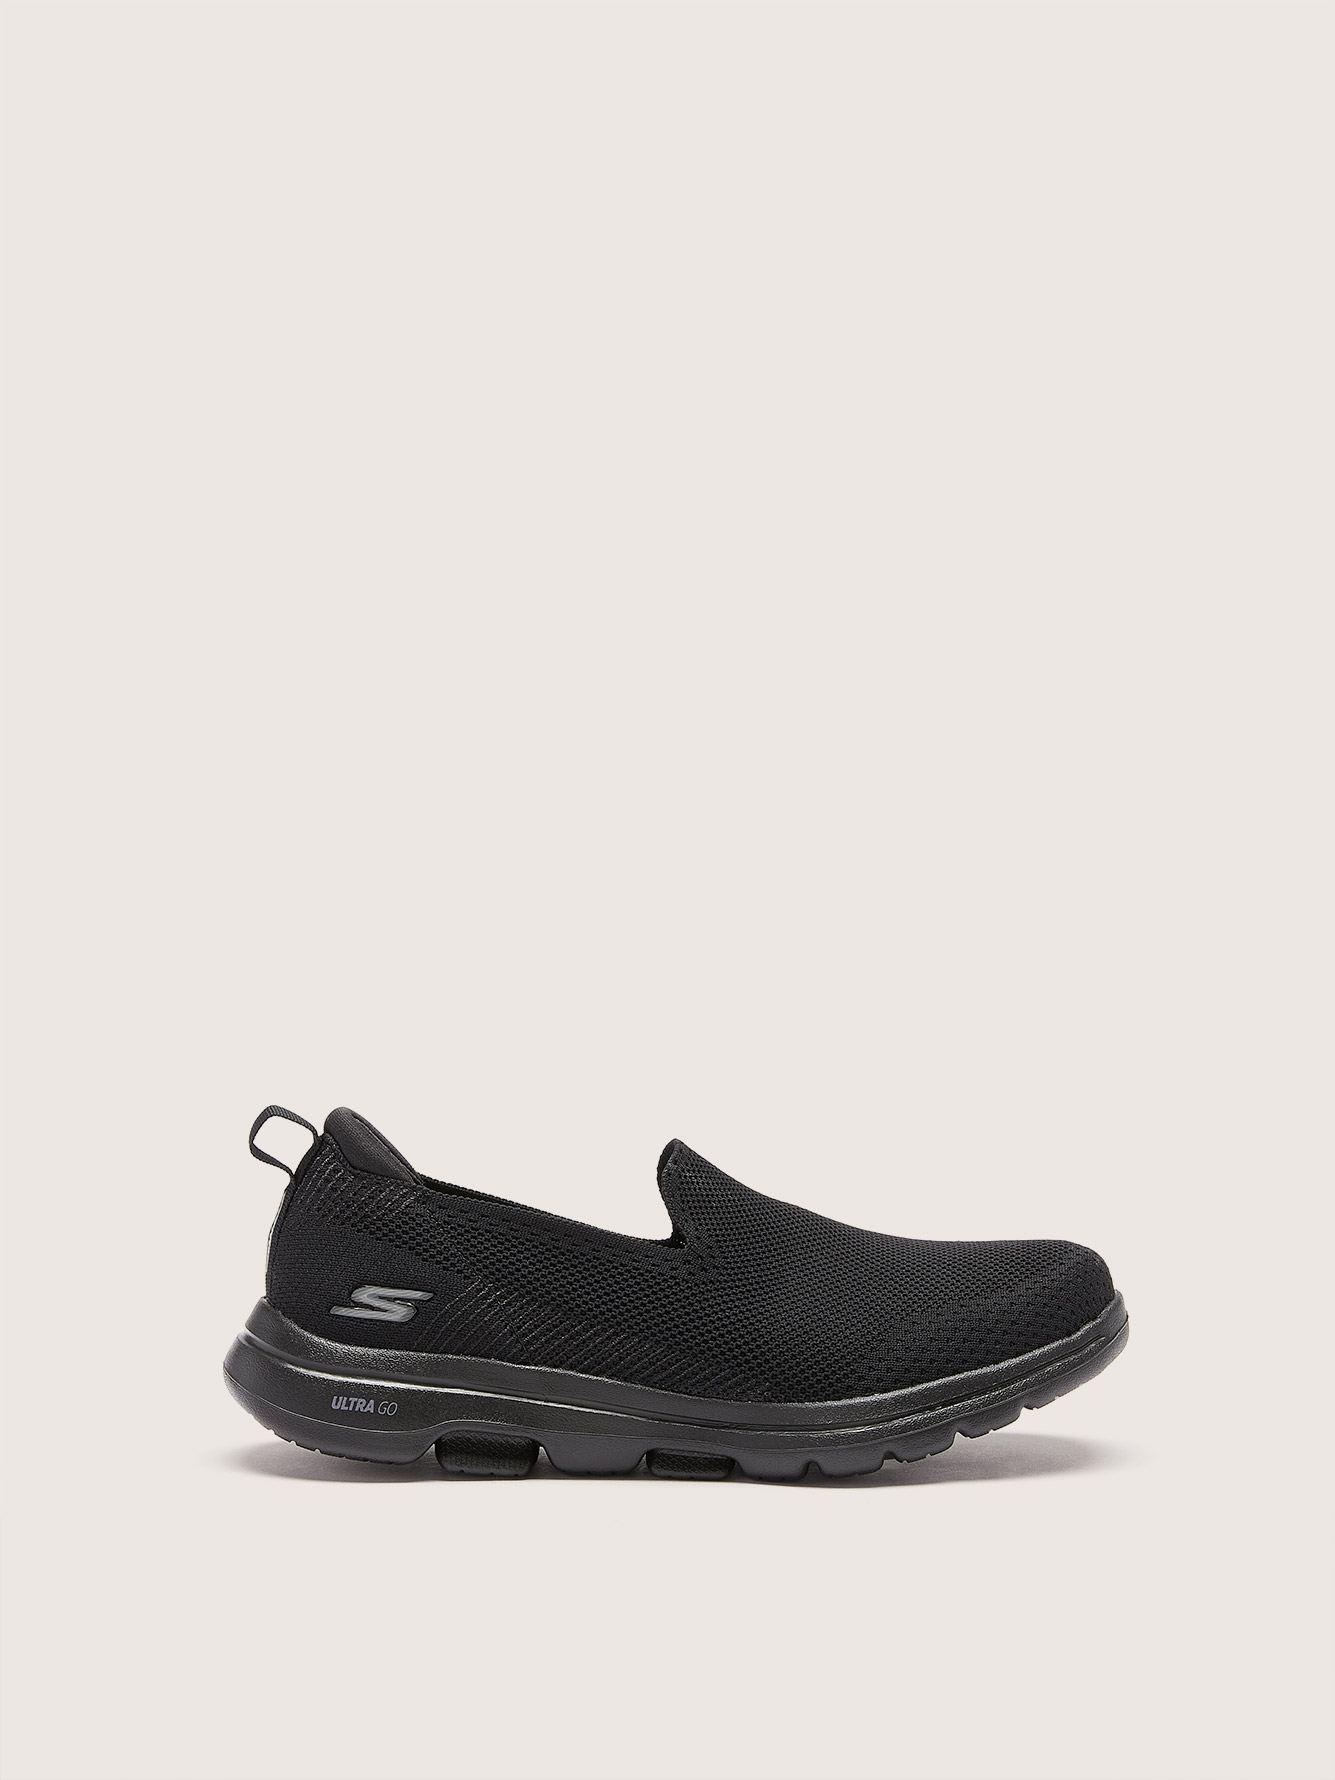 Wide GOWALK 5 Slip On Sneakers